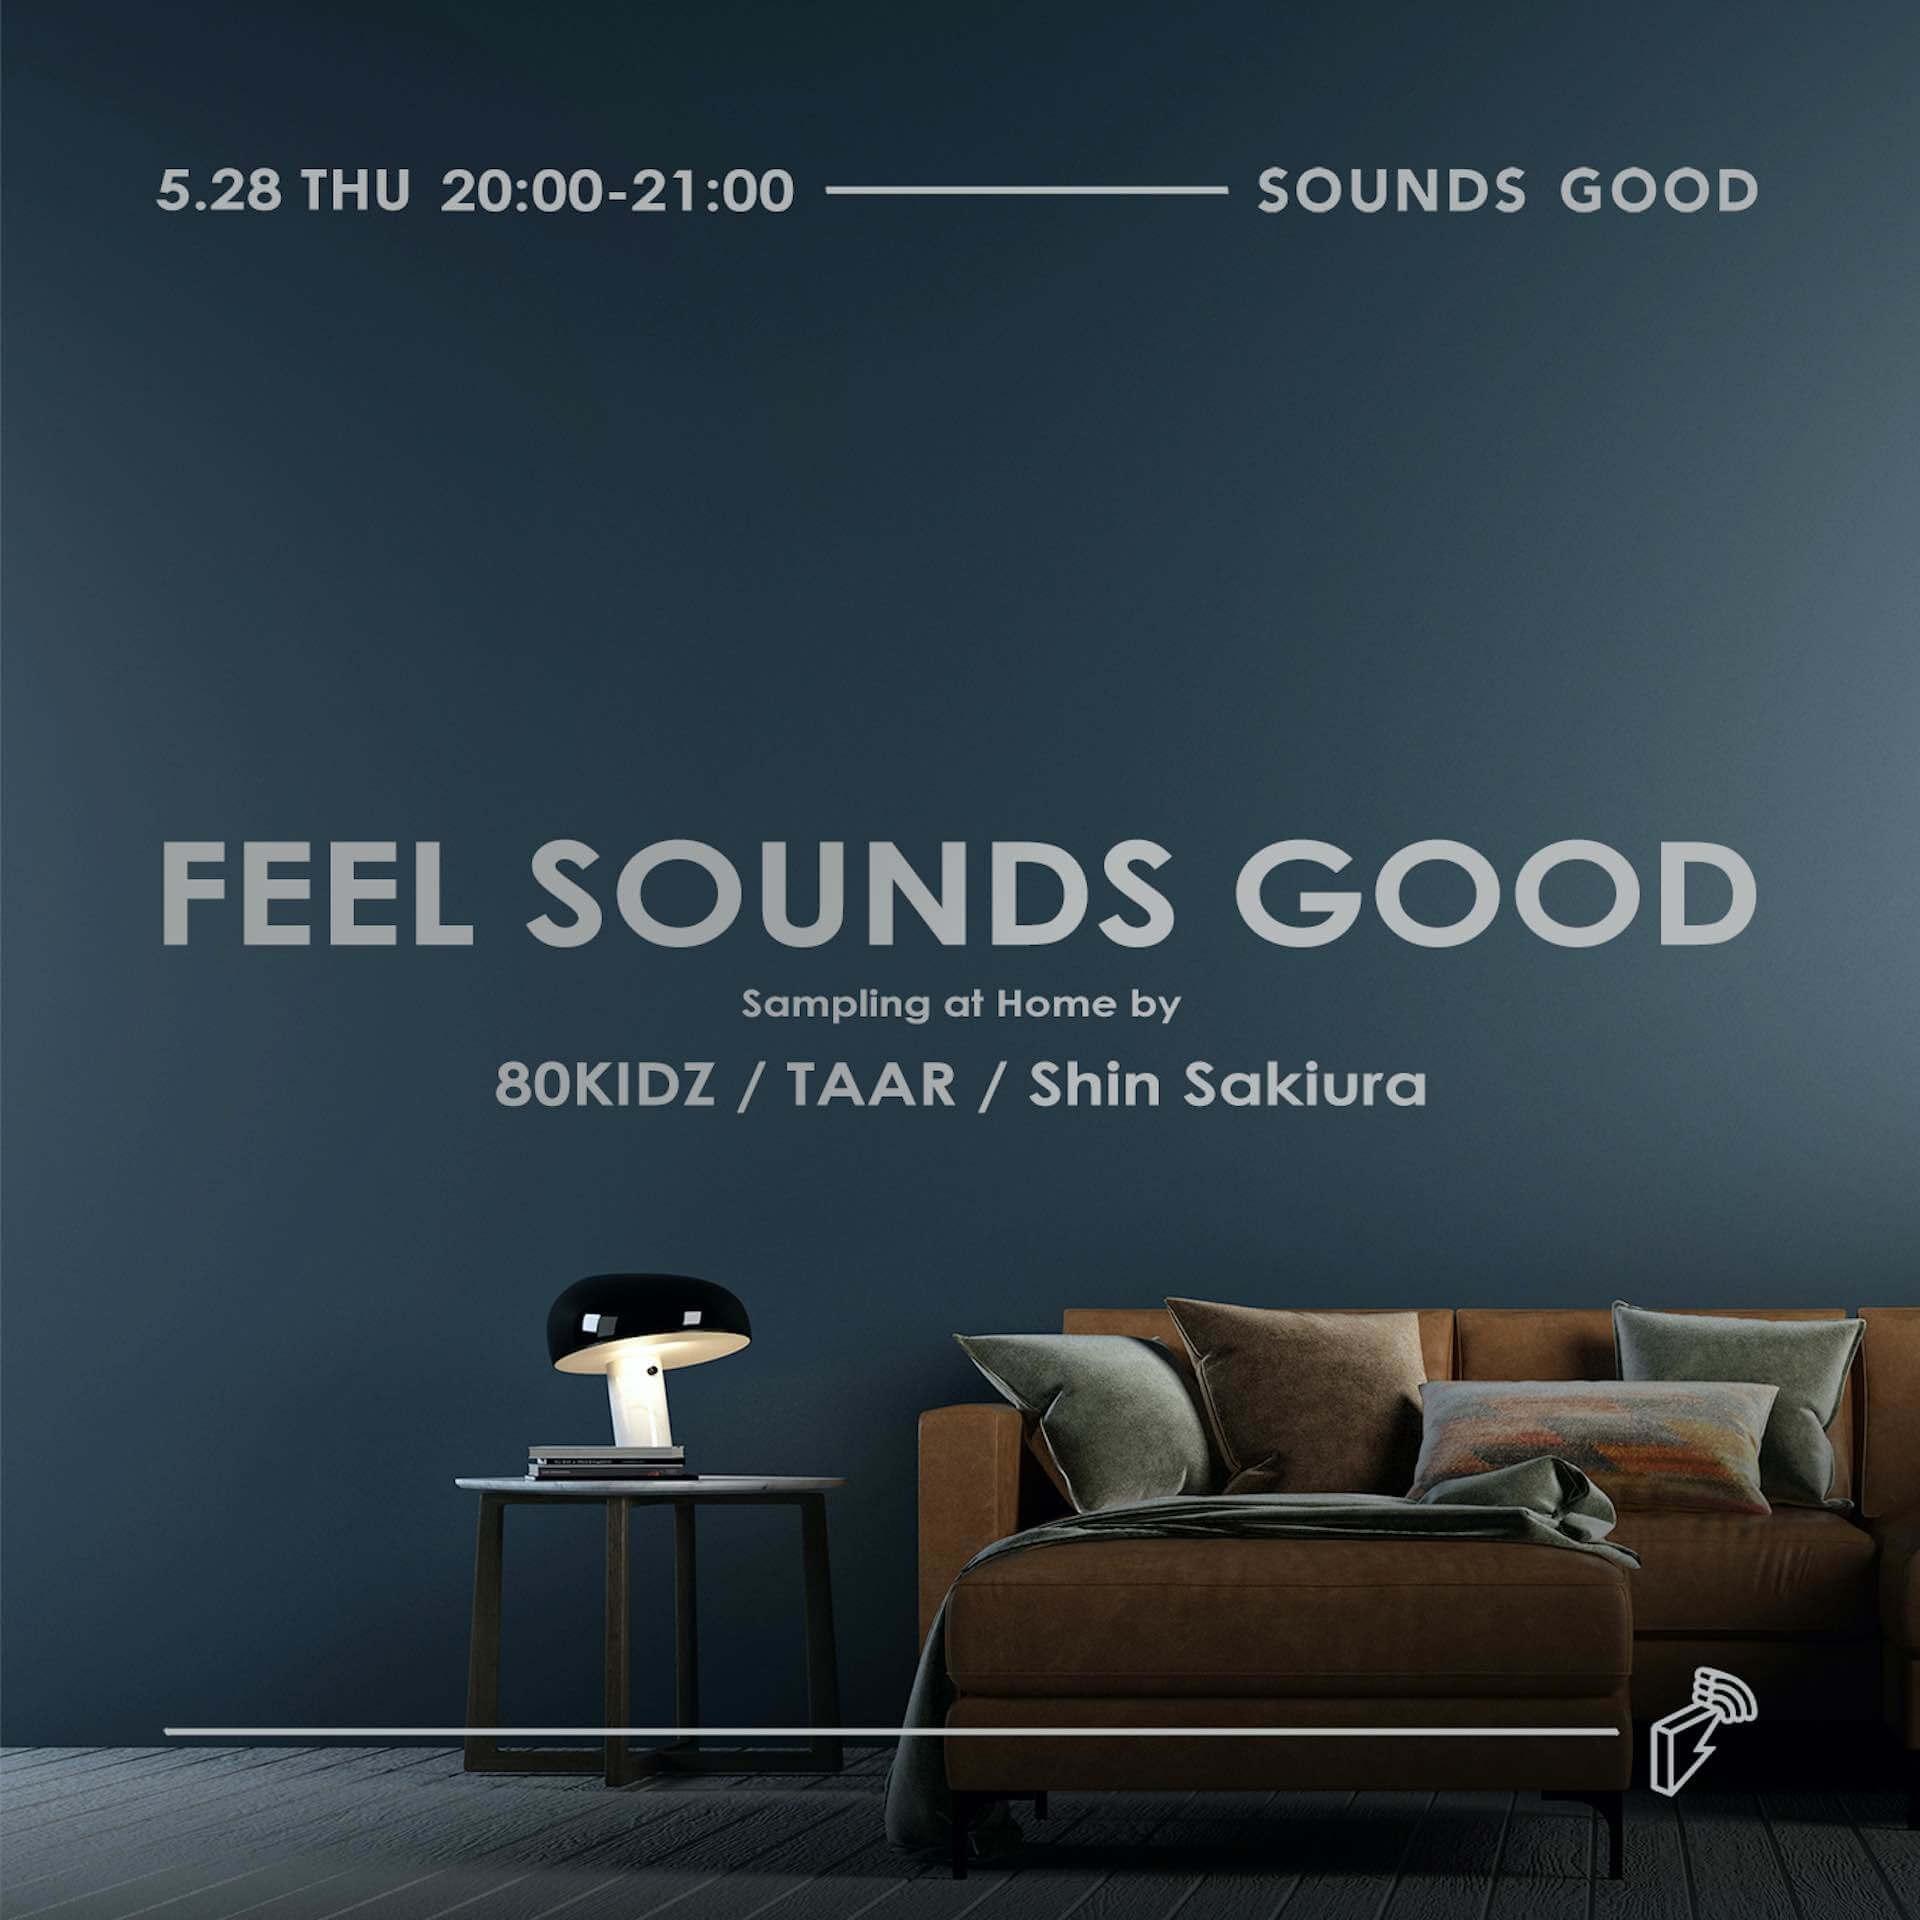 SOUNDS GOOD®︎とblock.fmのコラボ特番が本日放送|80KIDZ、TAAR、Shin Sakiuraが「ホームサンプリング」 music200527_soundsgood_4-1920x1920